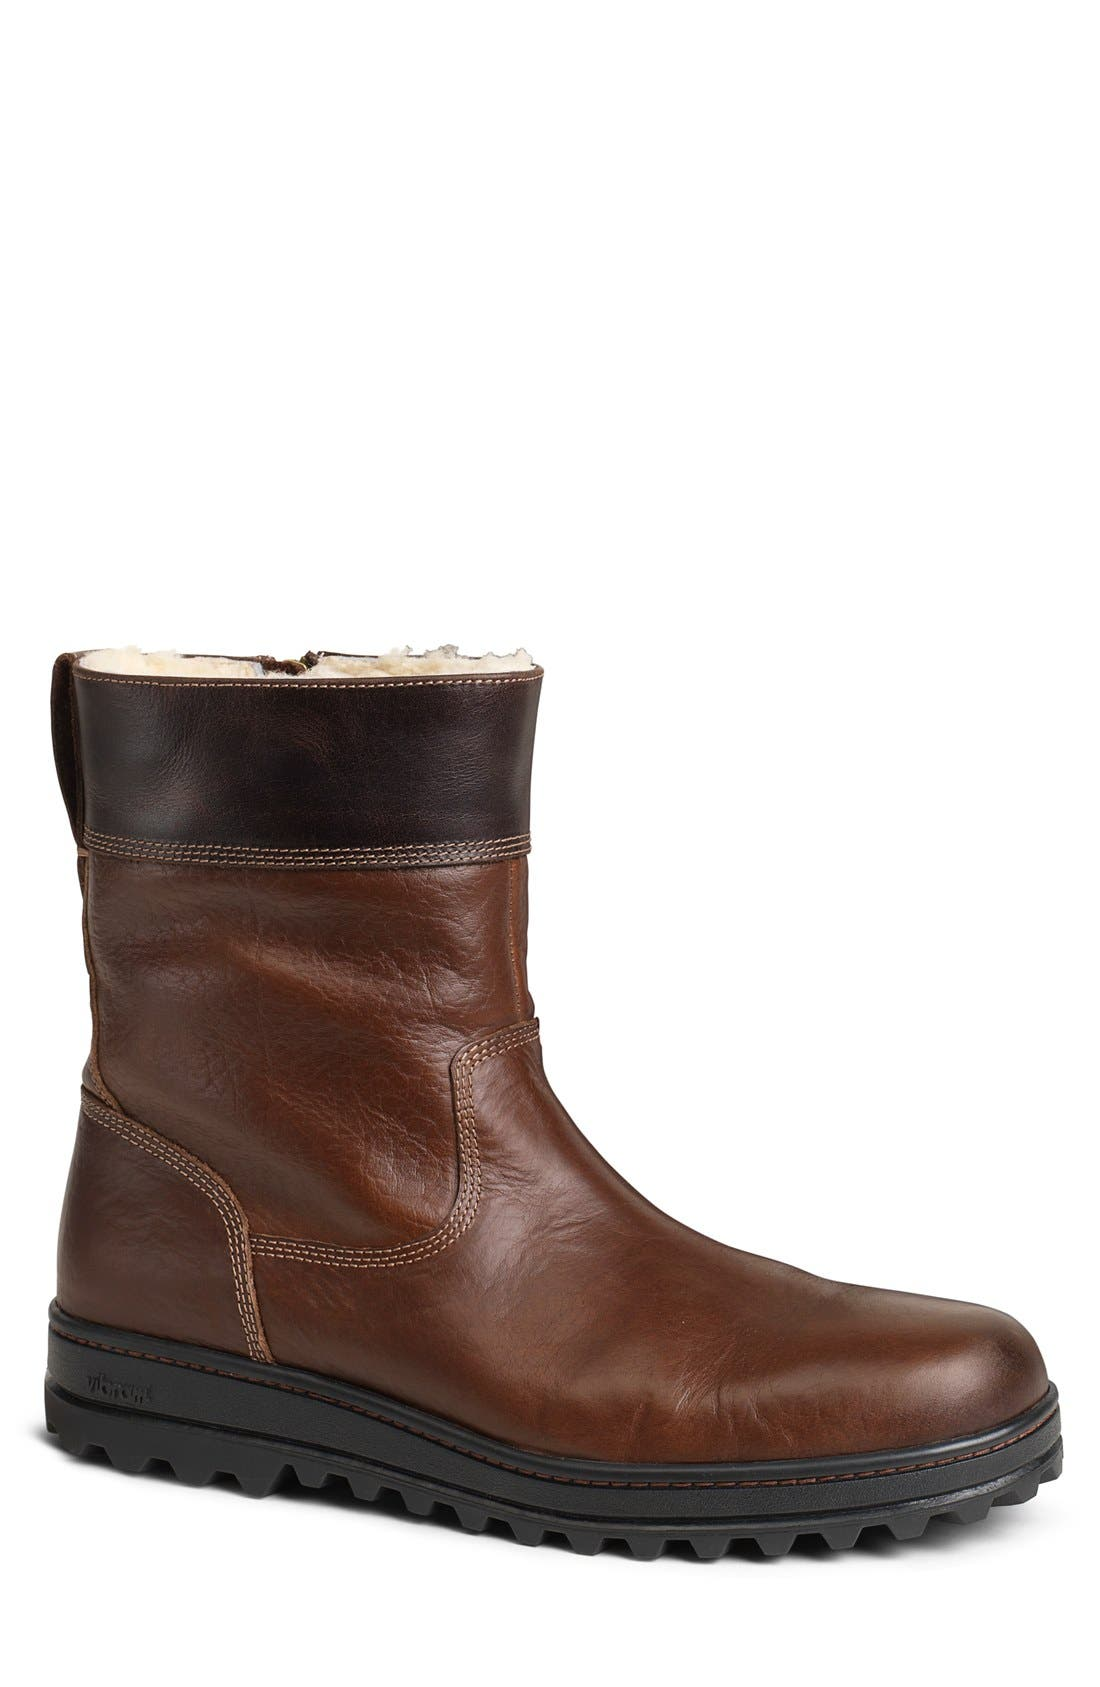 'Winslow' Plain Toe Boot,                         Main,                         color,